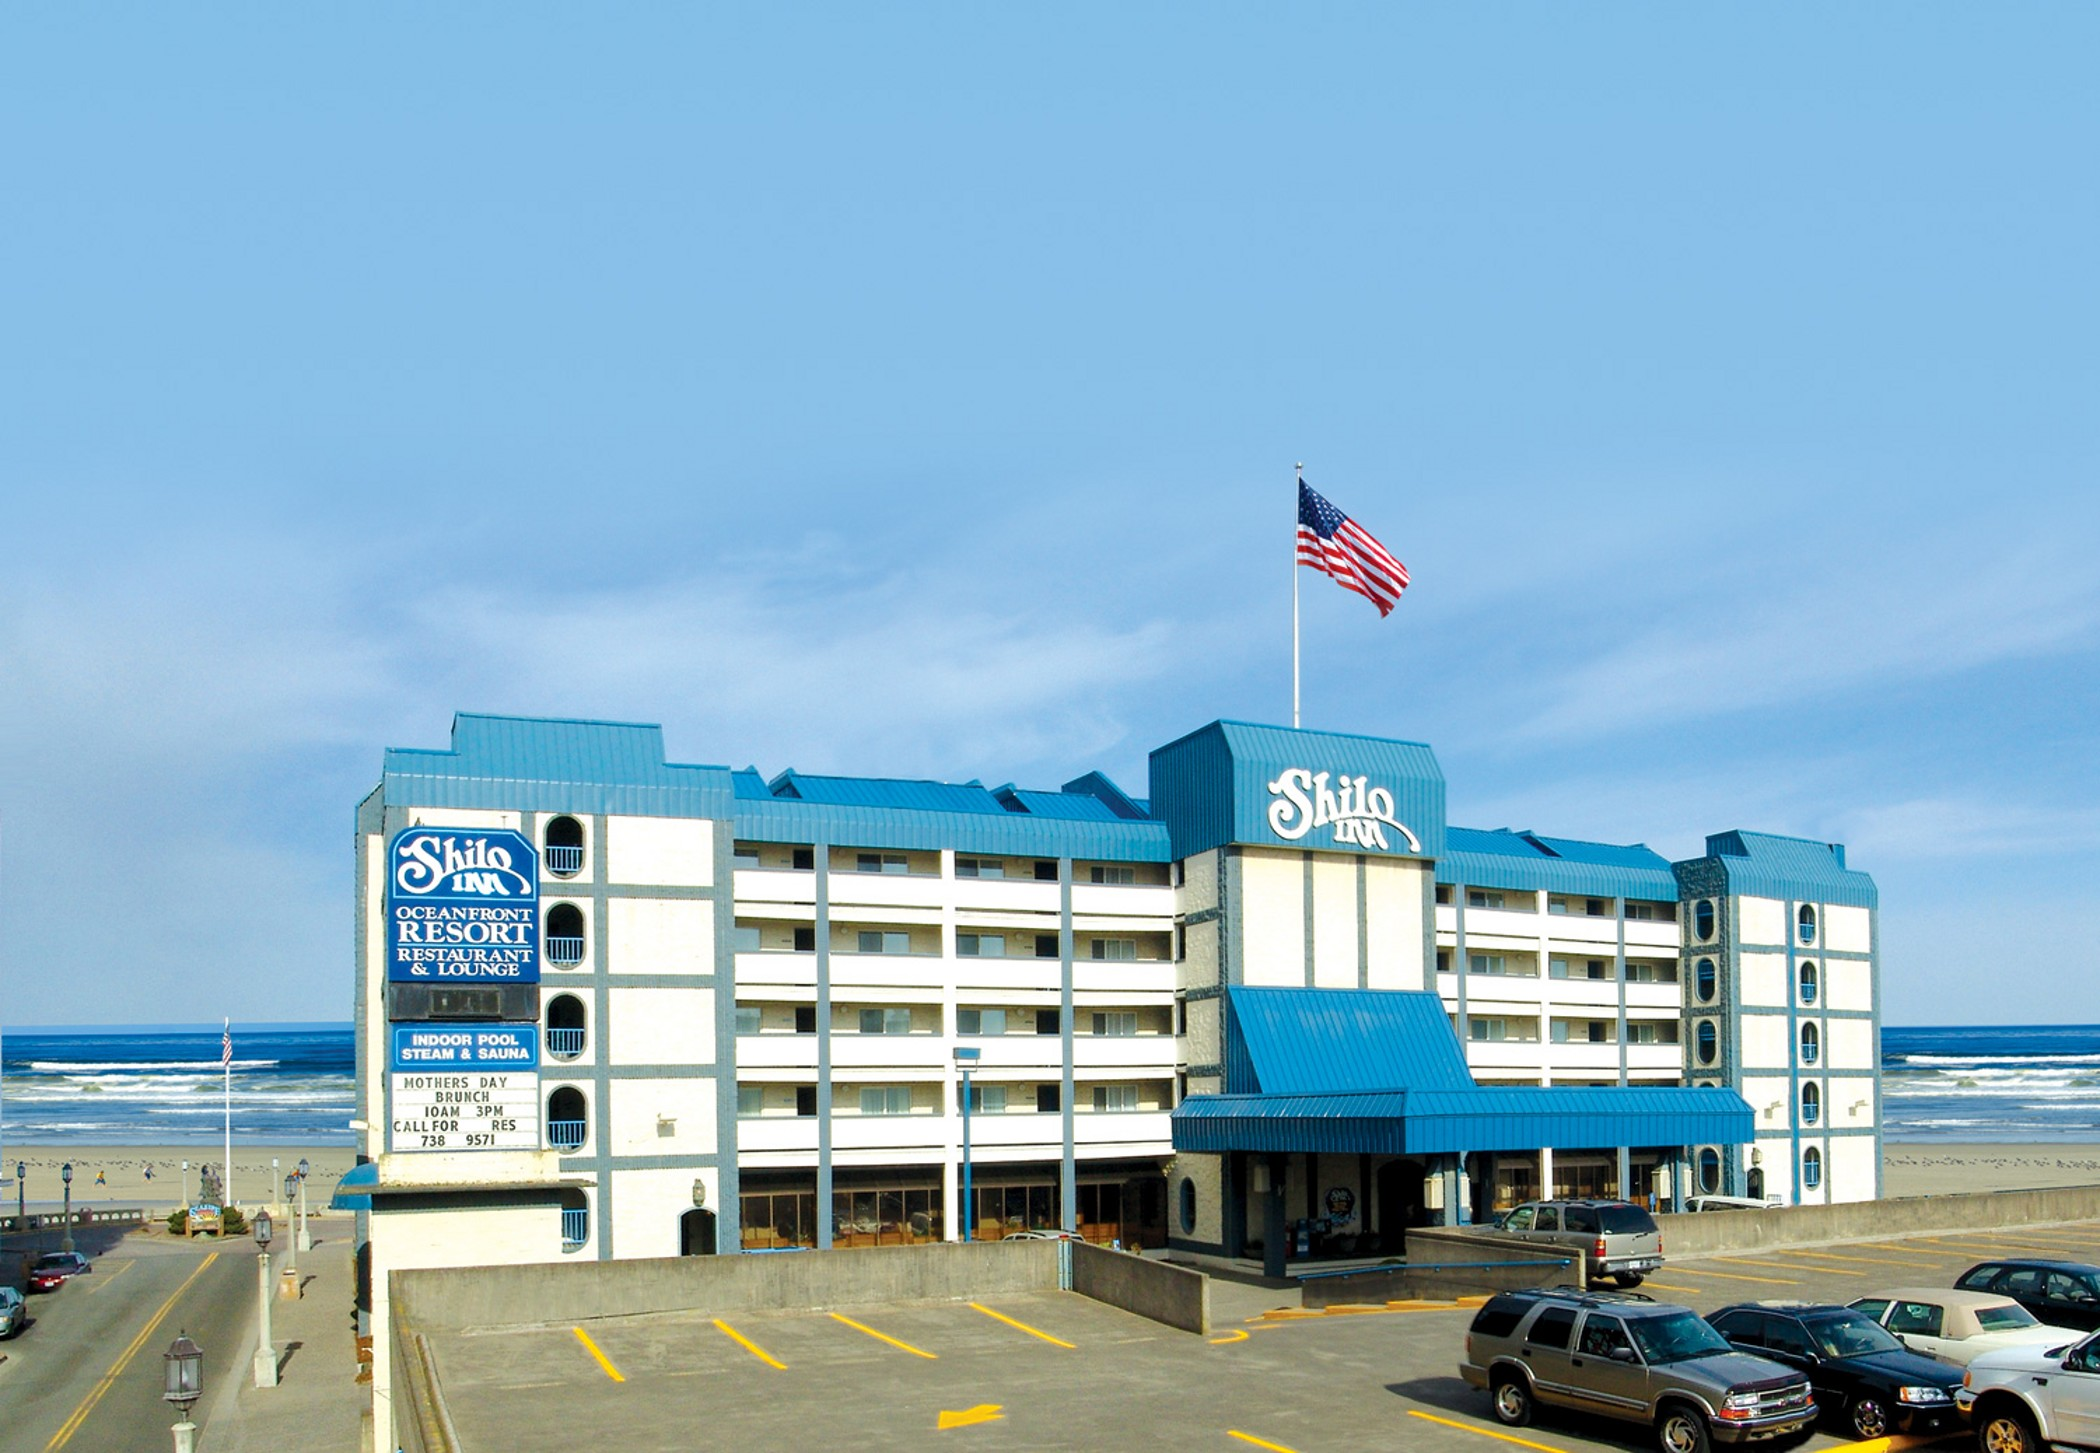 Shilo Inn Suites Oceanside Hotel Seaside, Clatsop